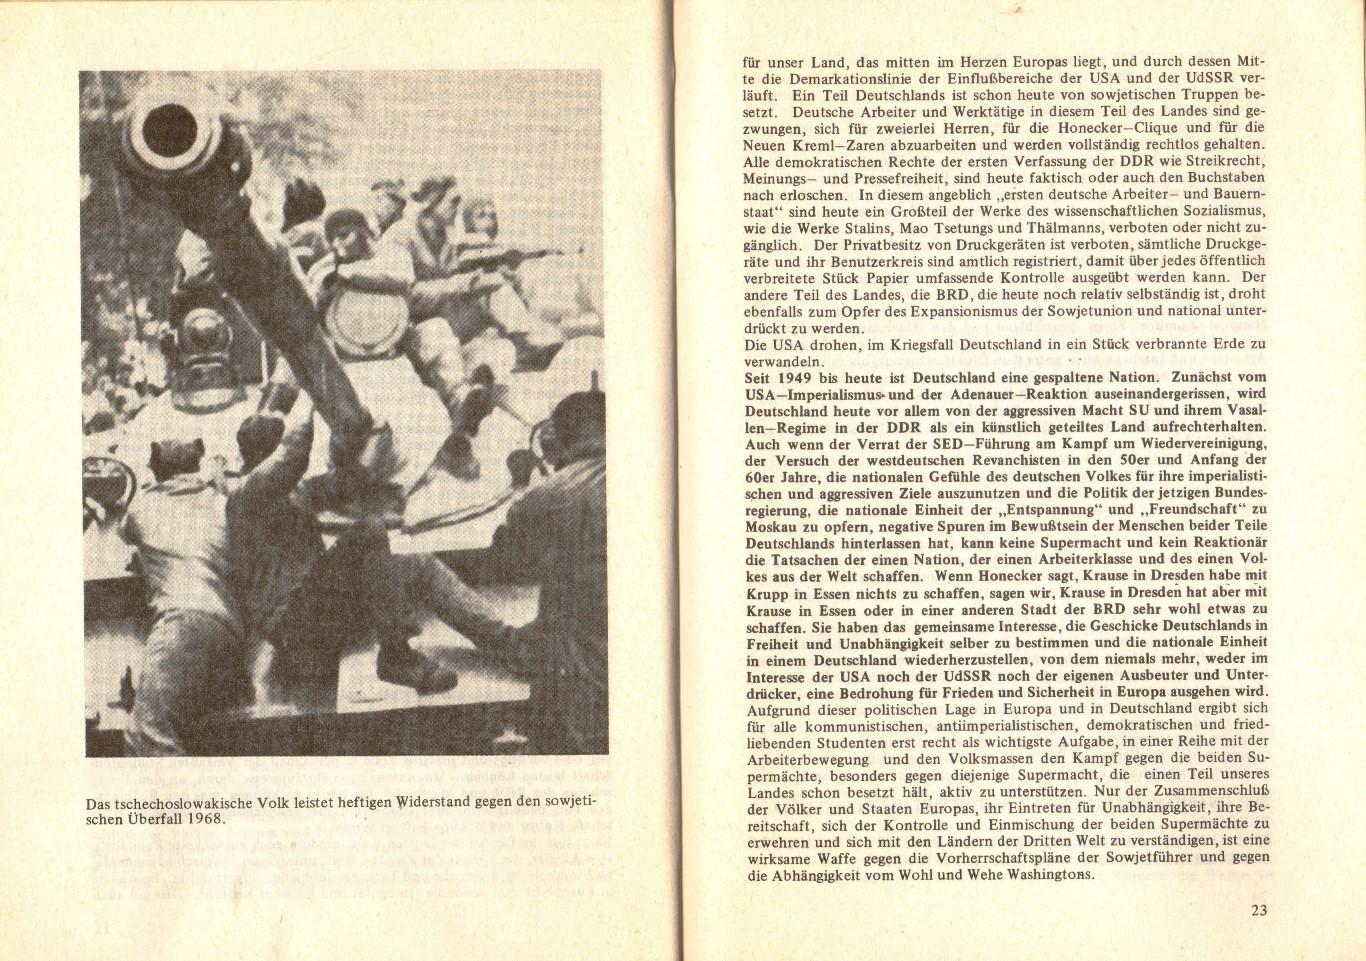 KSV_1976_Verfasste_Studentenschaft_13